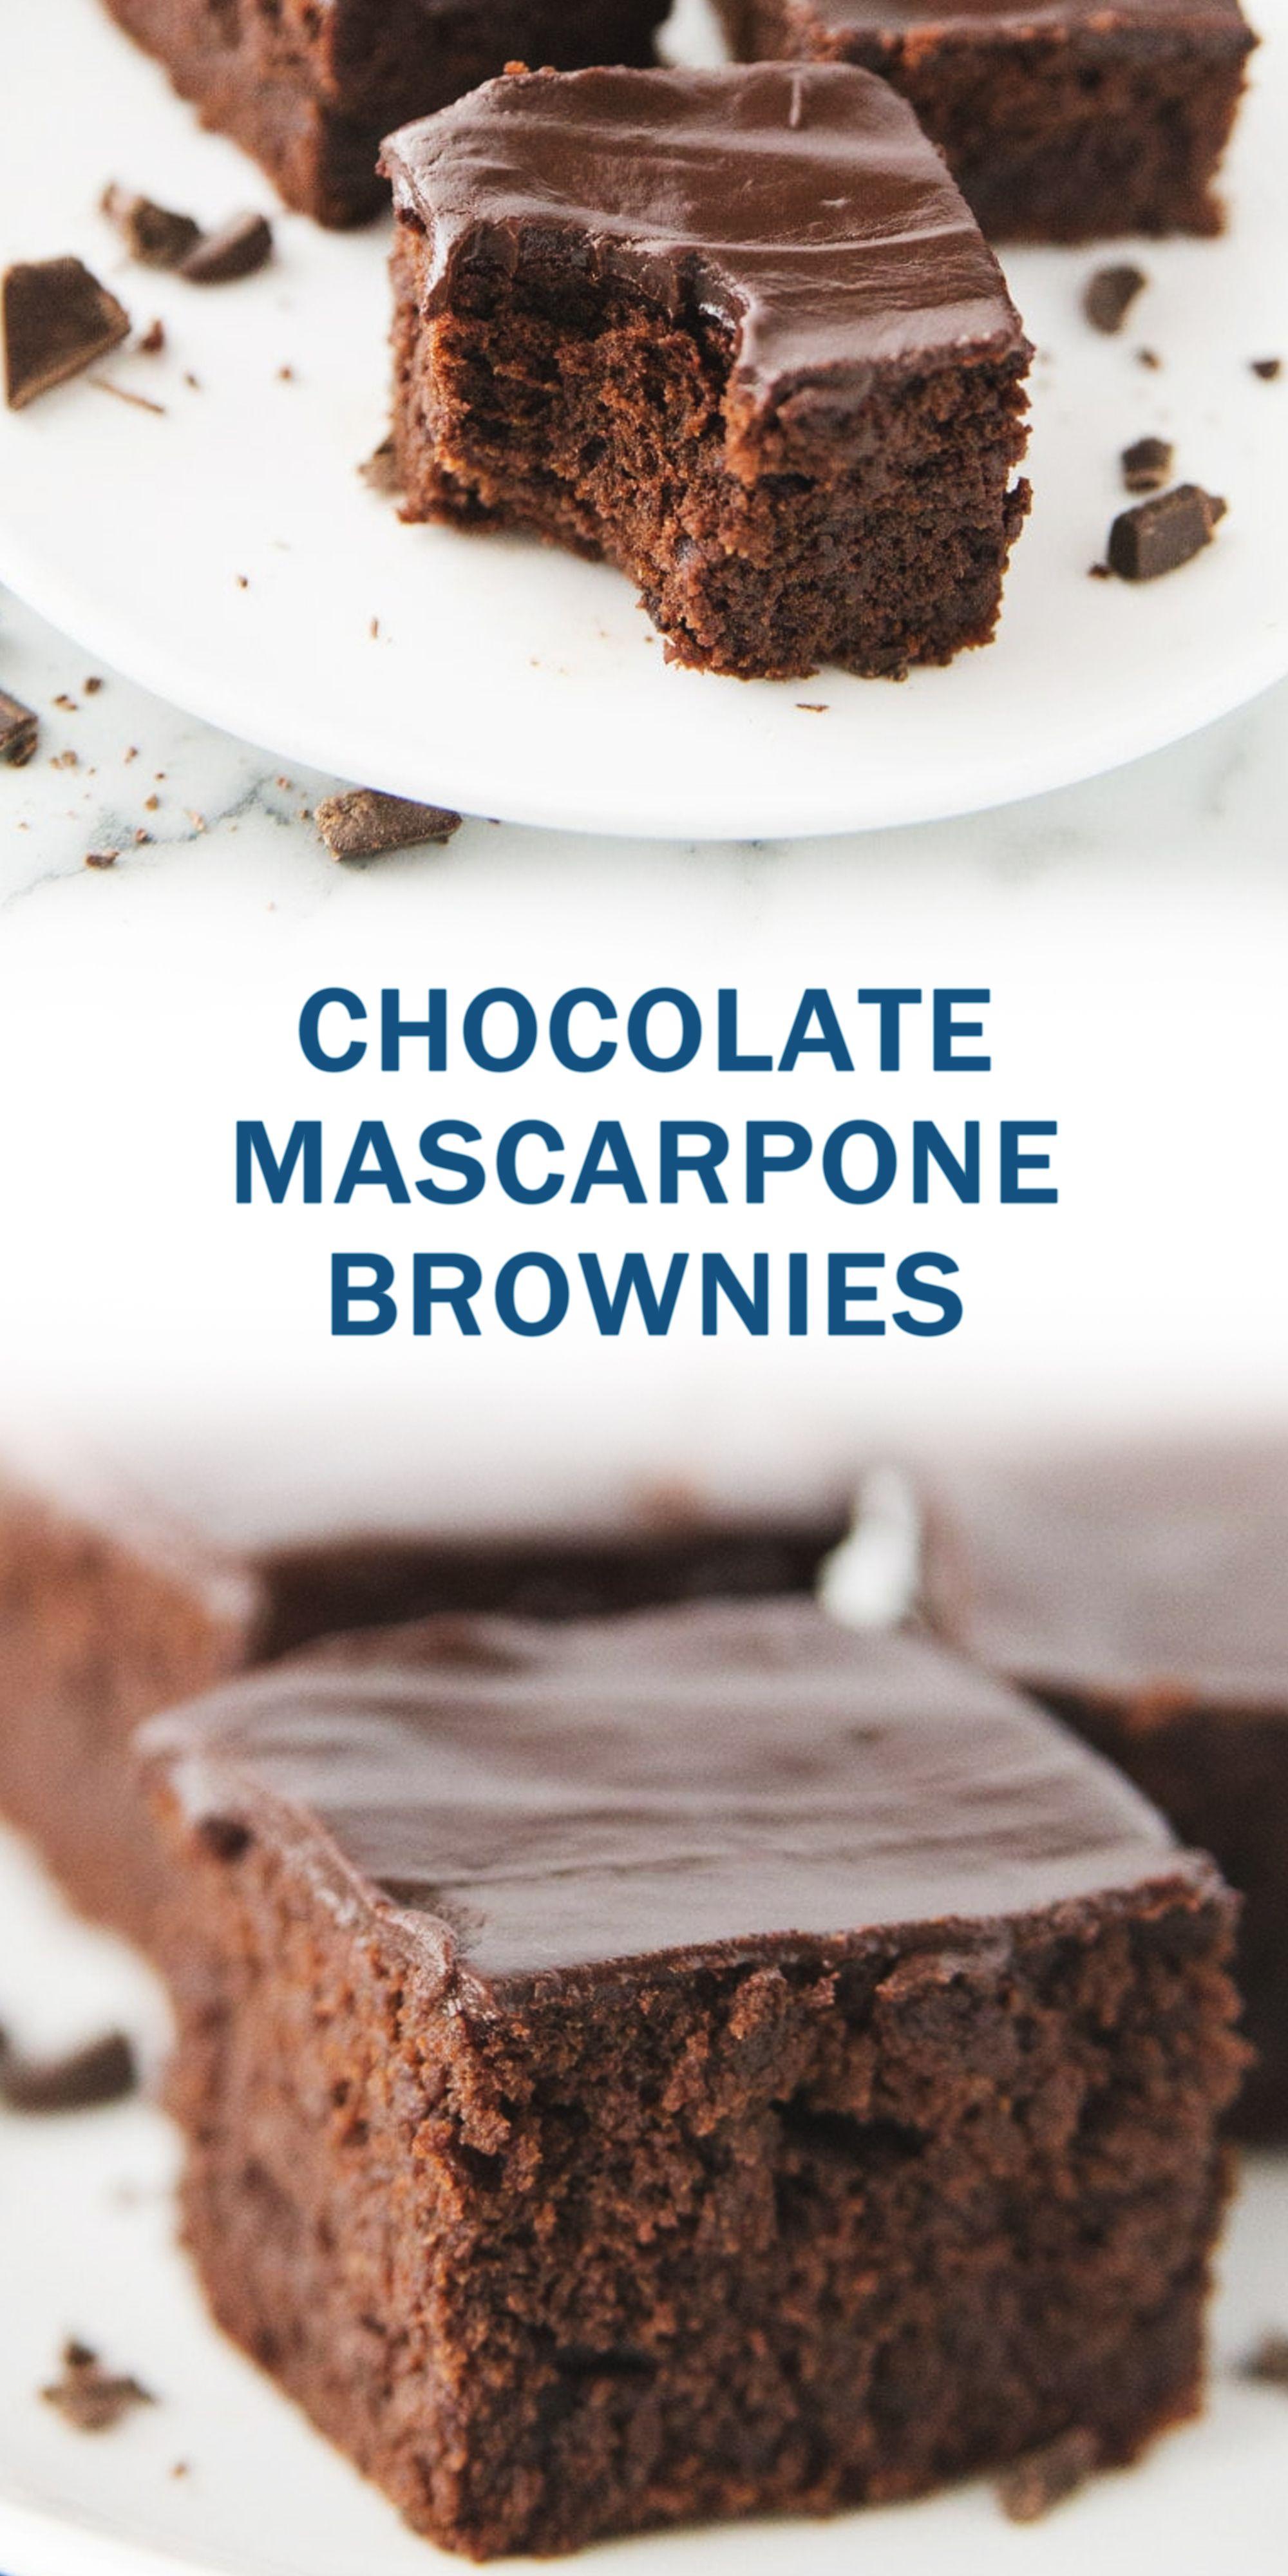 CHOCOLATE MASCARPONE BROWNIES en 2020 (avec images ...